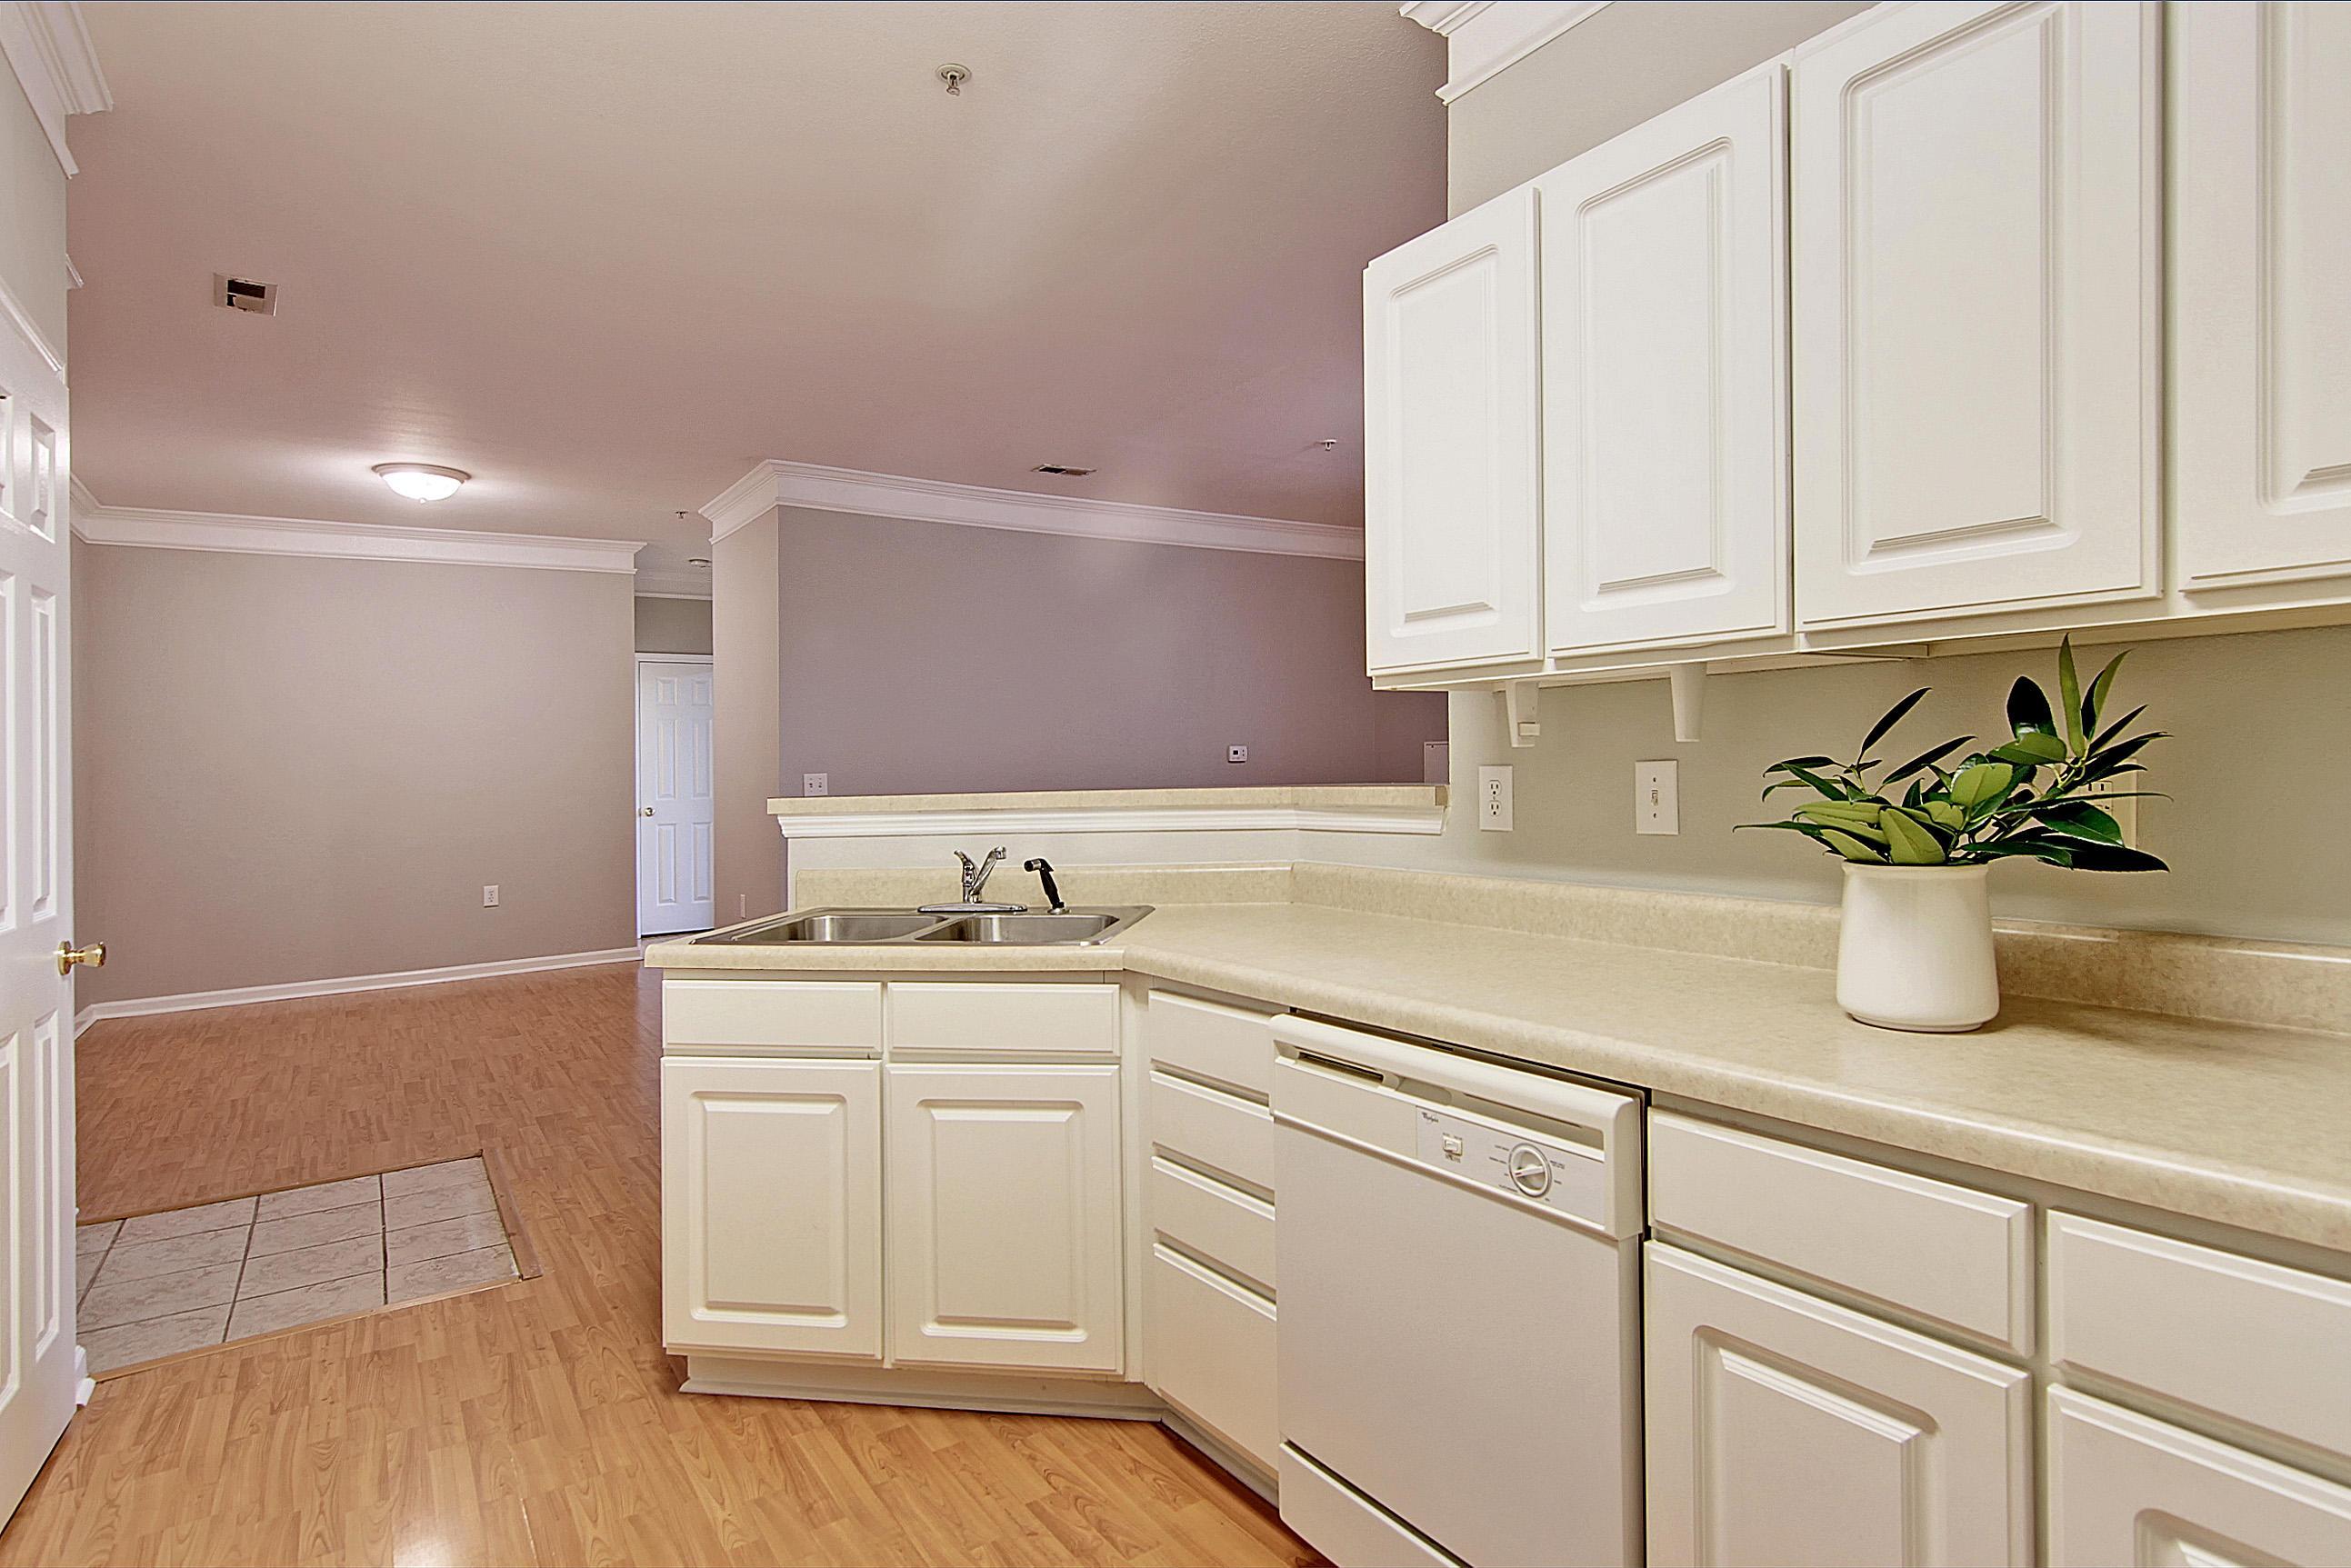 Cambridge Lakes Homes For Sale - 1445 Cambridge Lakes, Mount Pleasant, SC - 7